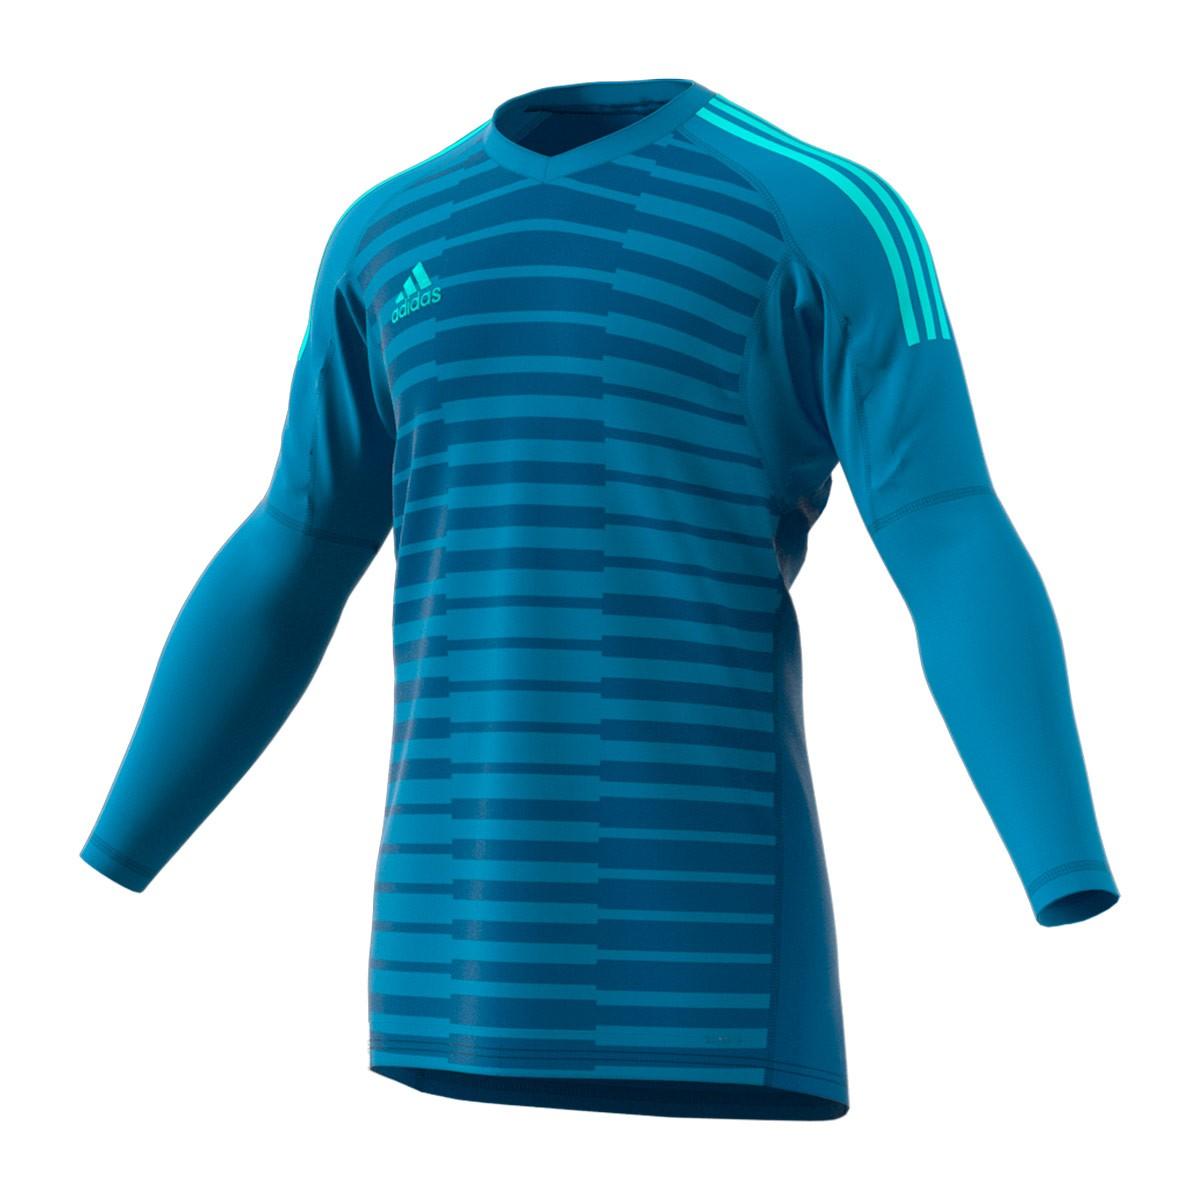 maillot adidas adipro 18 blue